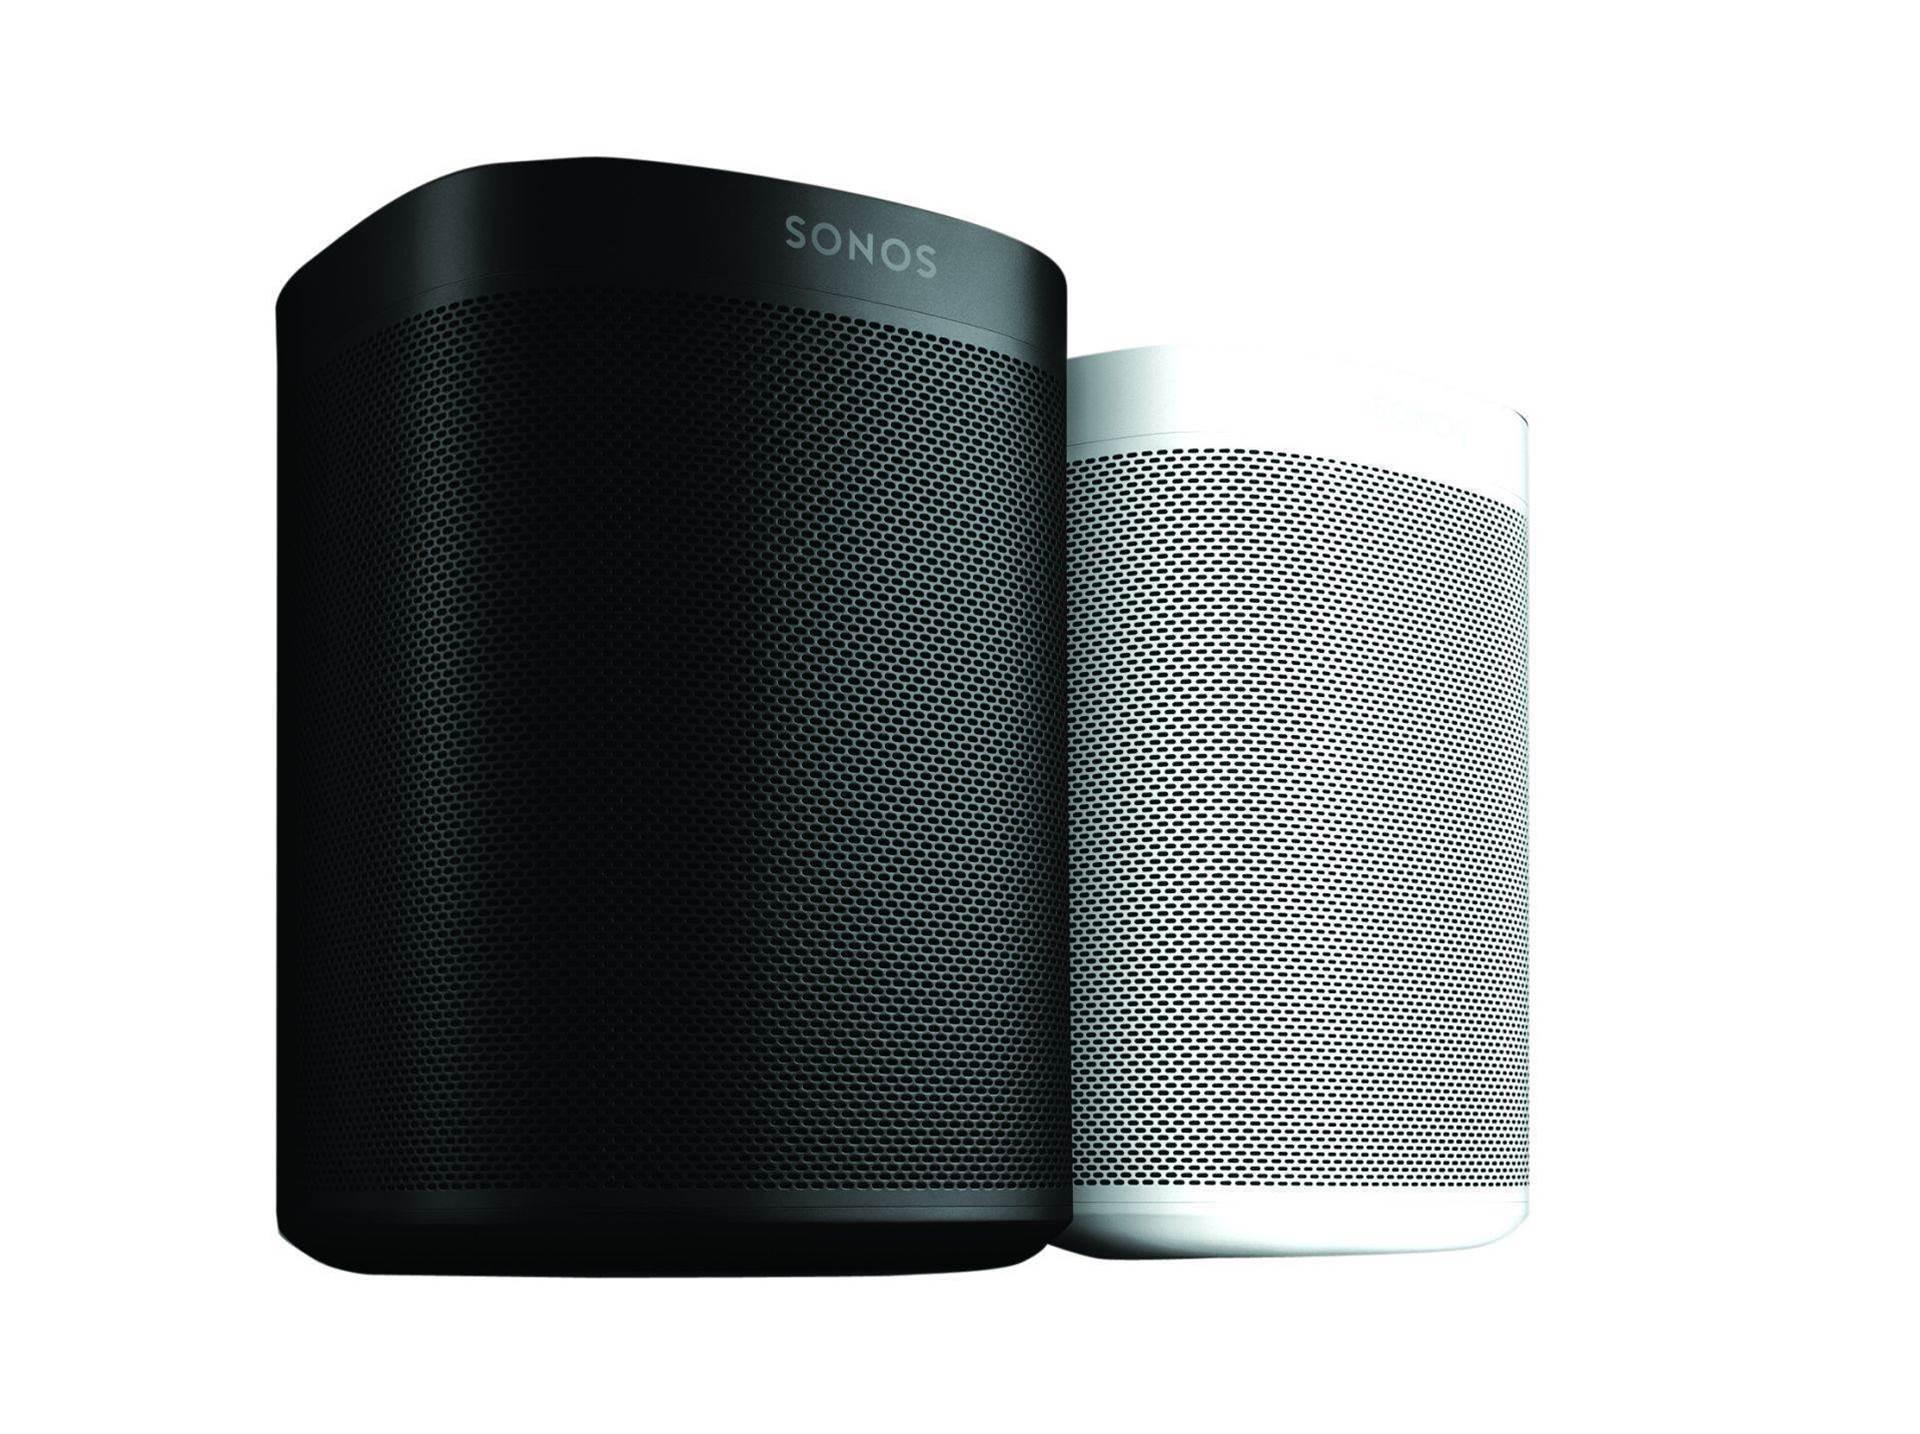 Review: Sonos One smart speaker